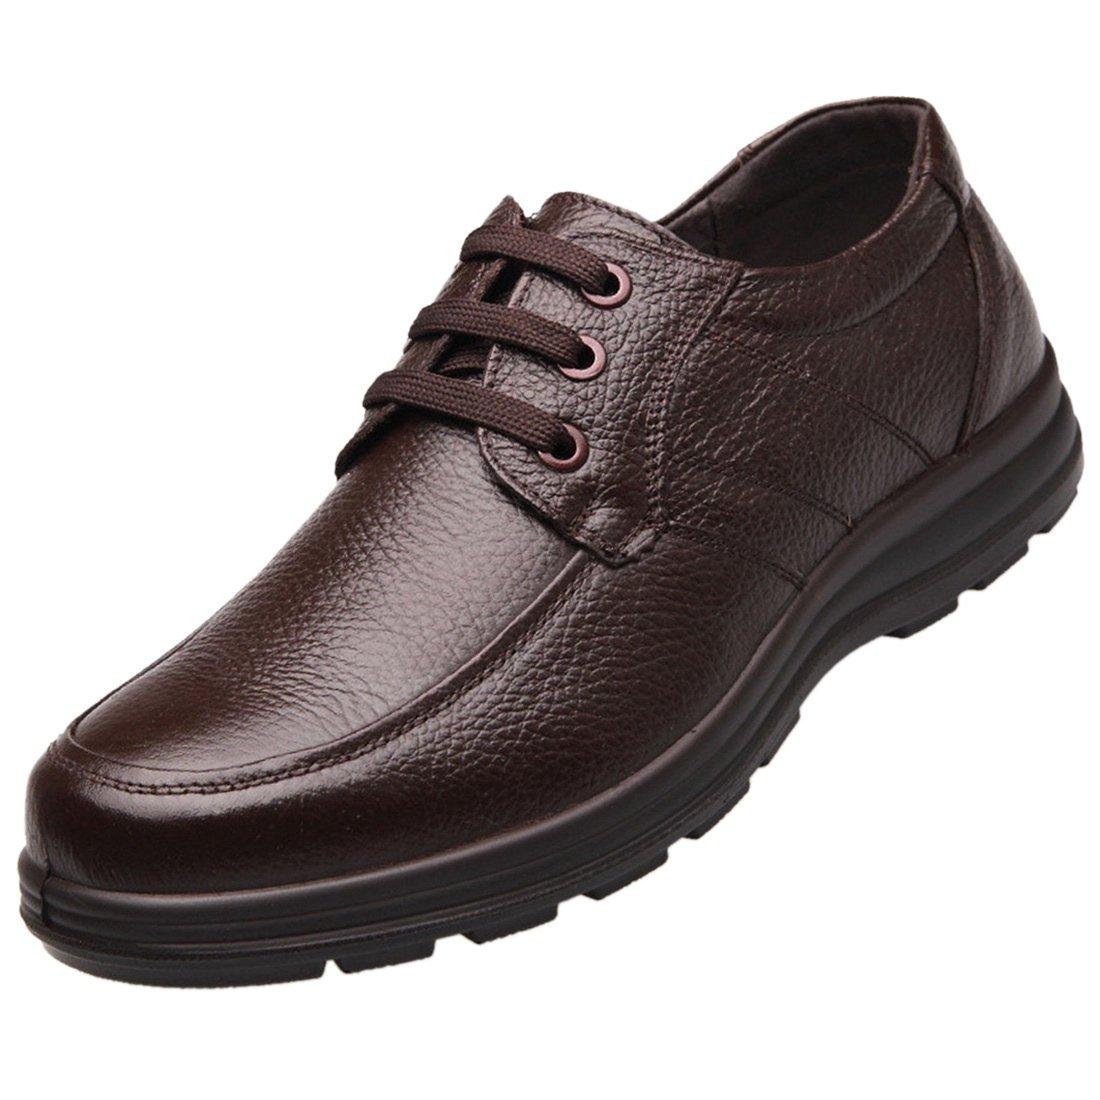 Enerhu Men Lace-up Chef Shoe Leather Flat Work Shoe Nonslip Oil Resistant Waterproof Brown Asian 44/US 9.5